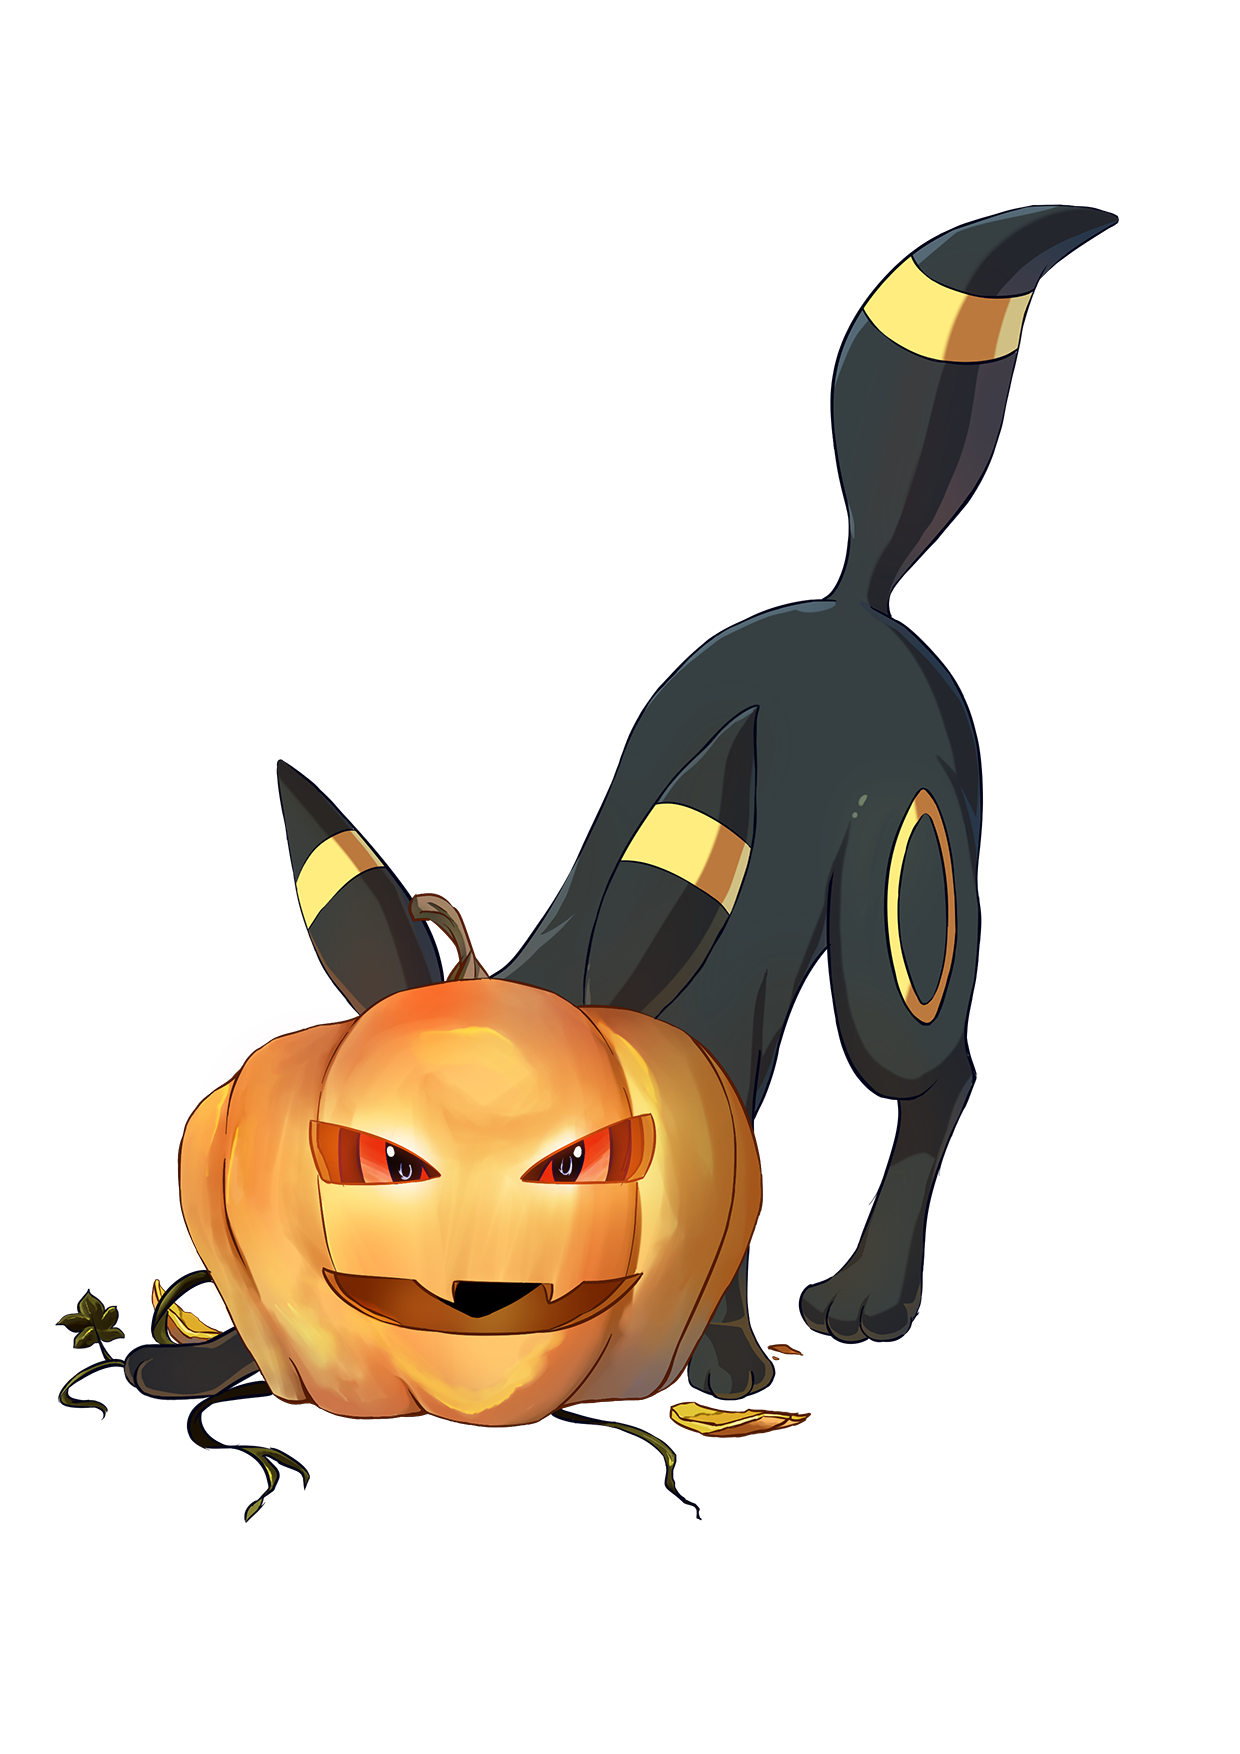 Muscle pumpkin clipart clip art free stock Umbreon as a Pumpkin   Pokémon   Know Your Meme clip art free stock